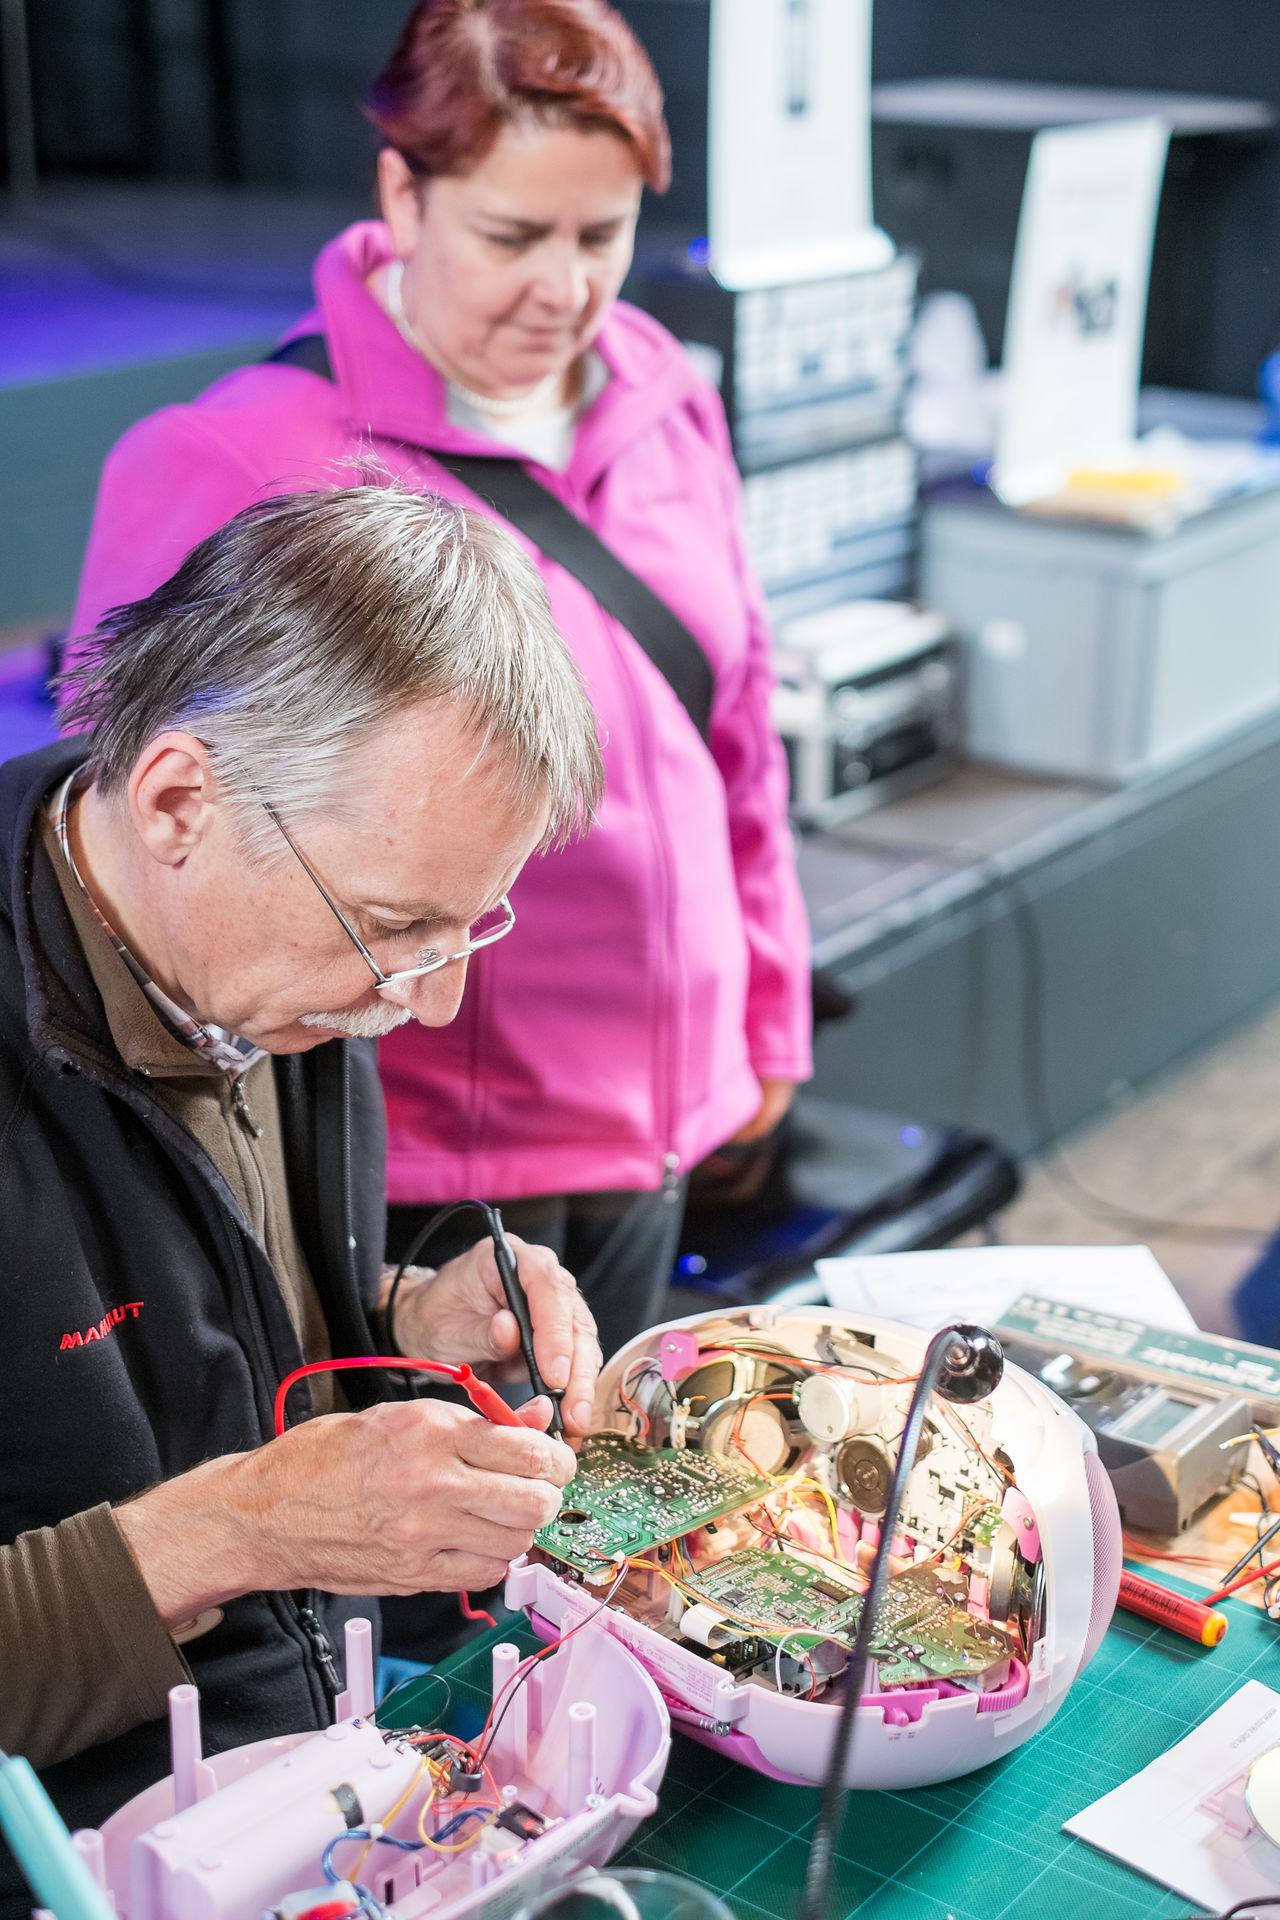 Reparaturtag: 30 Repair Cafés retten 2 Tonnen Geräte vor Abfall